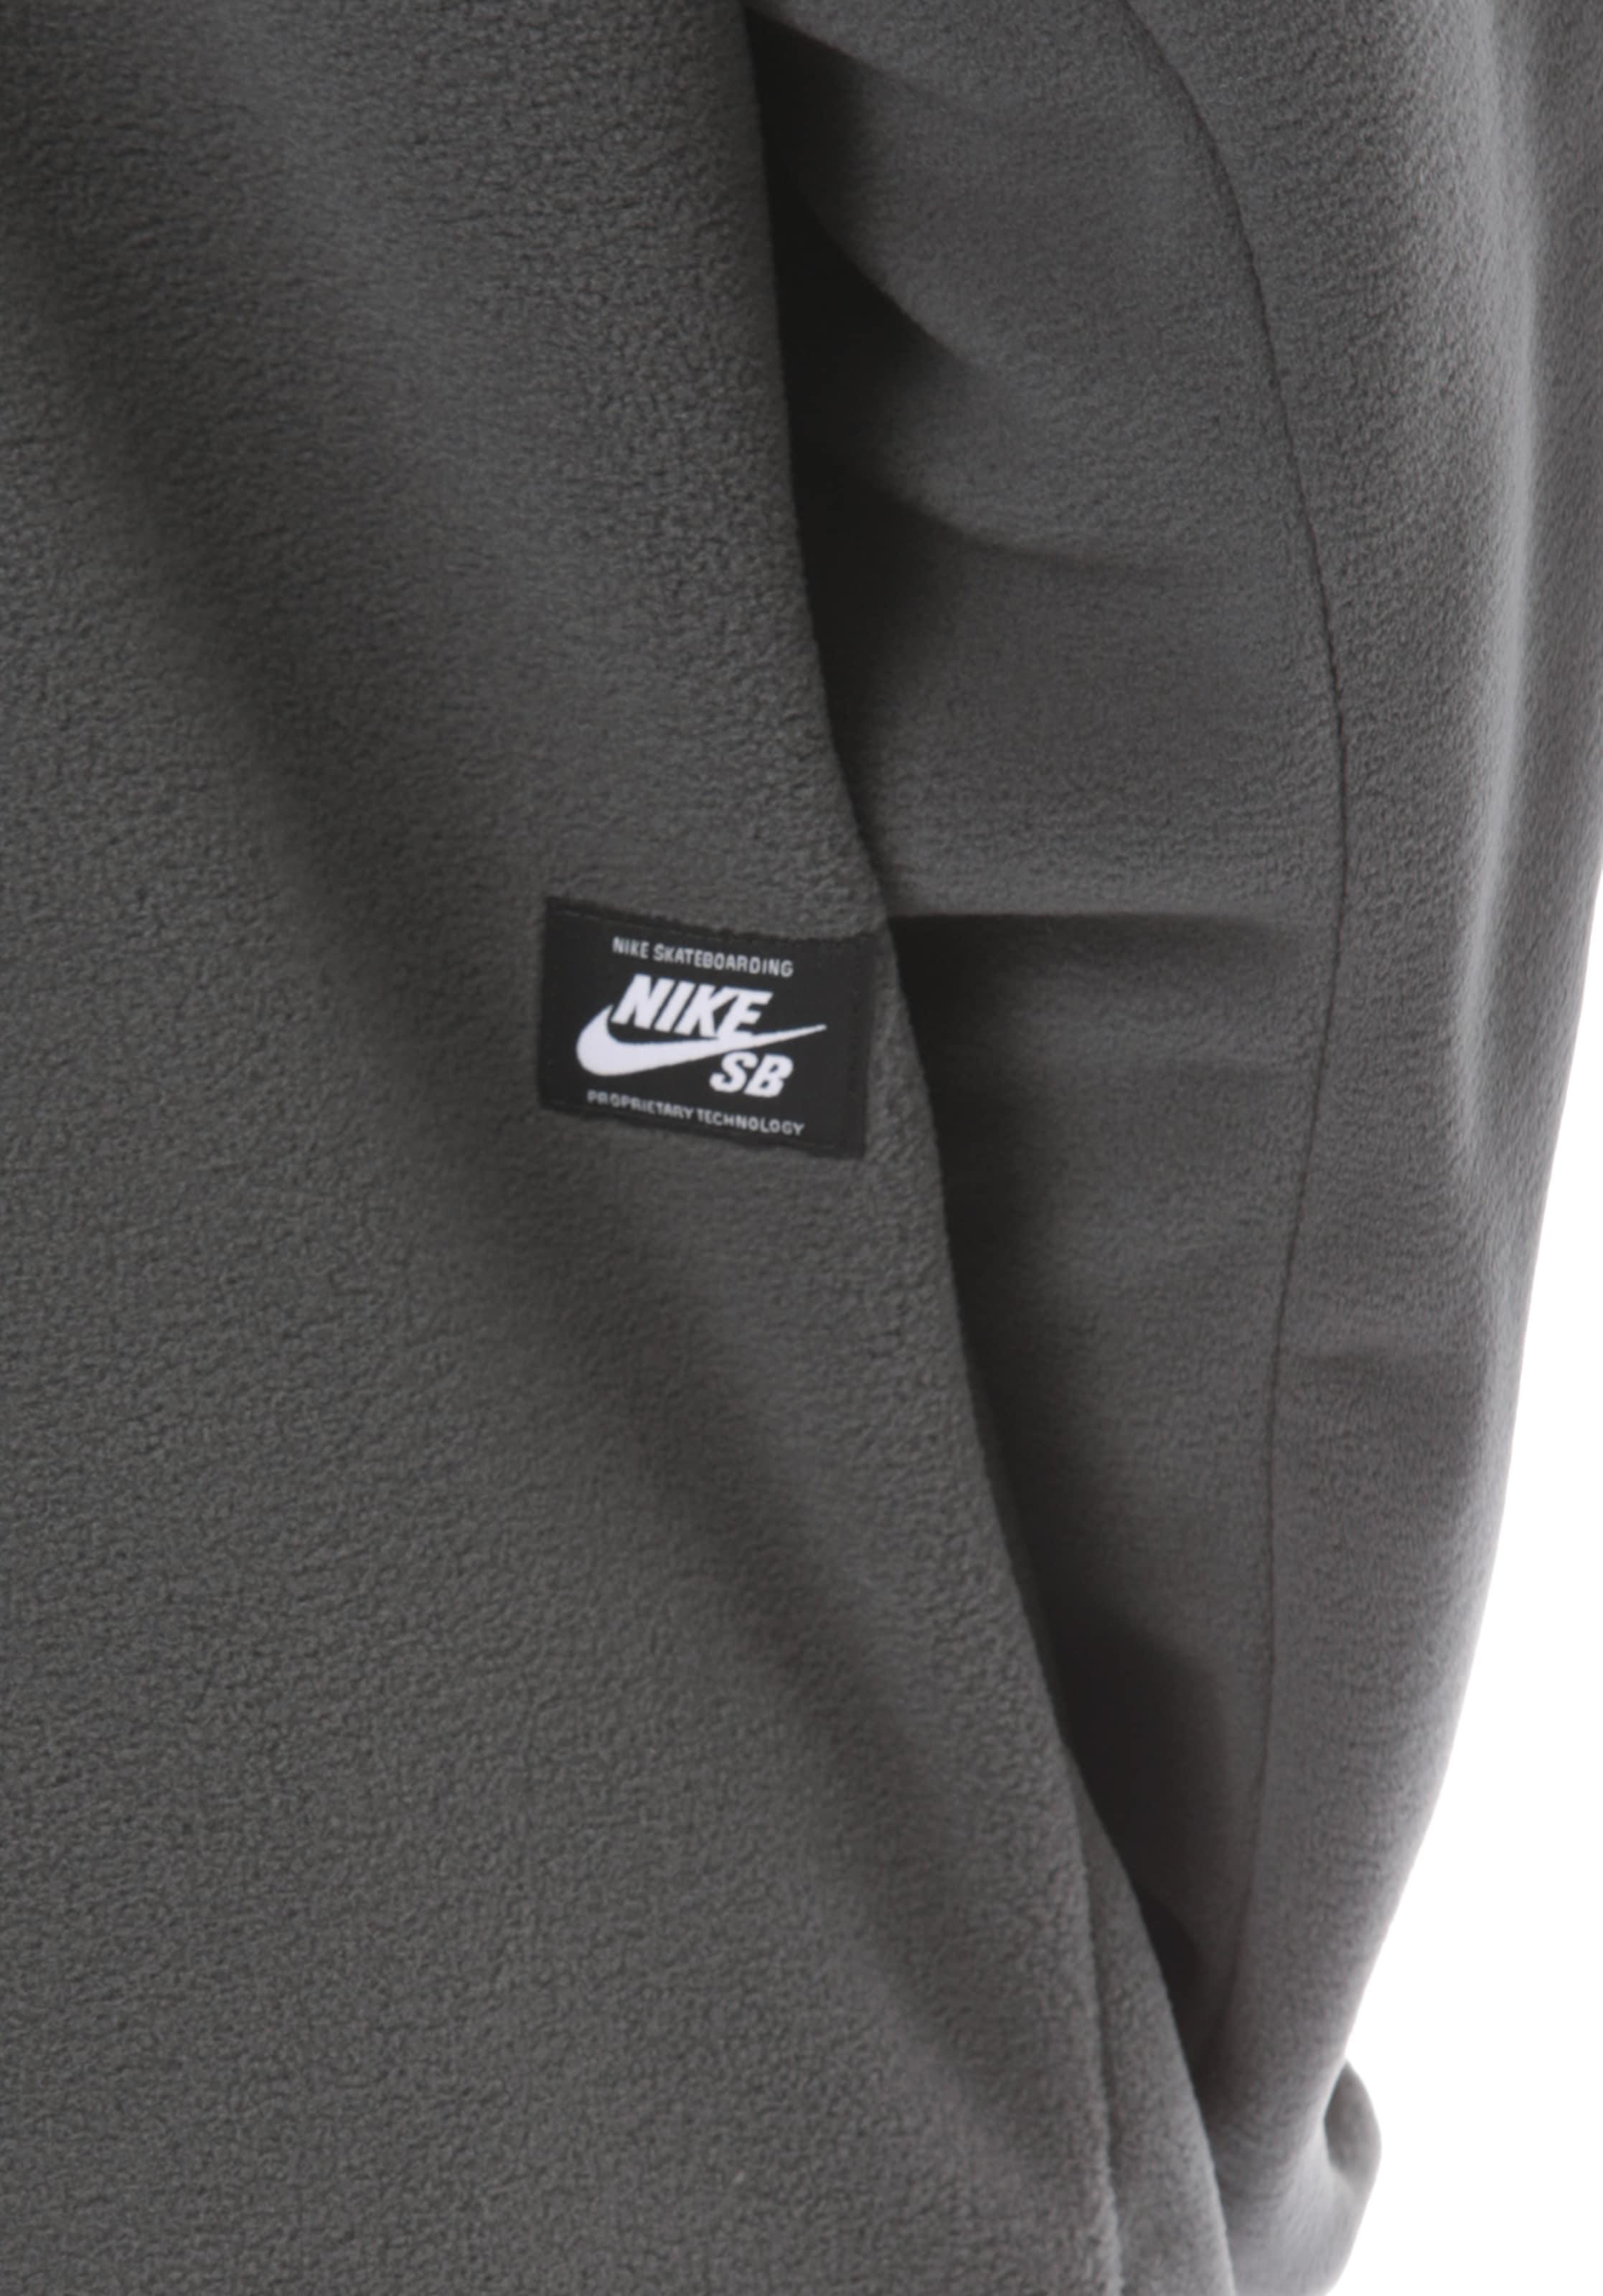 Sb In Nike DunkelgrauBordeaux Fleecejacke 'polartec' Yvbfg6y7